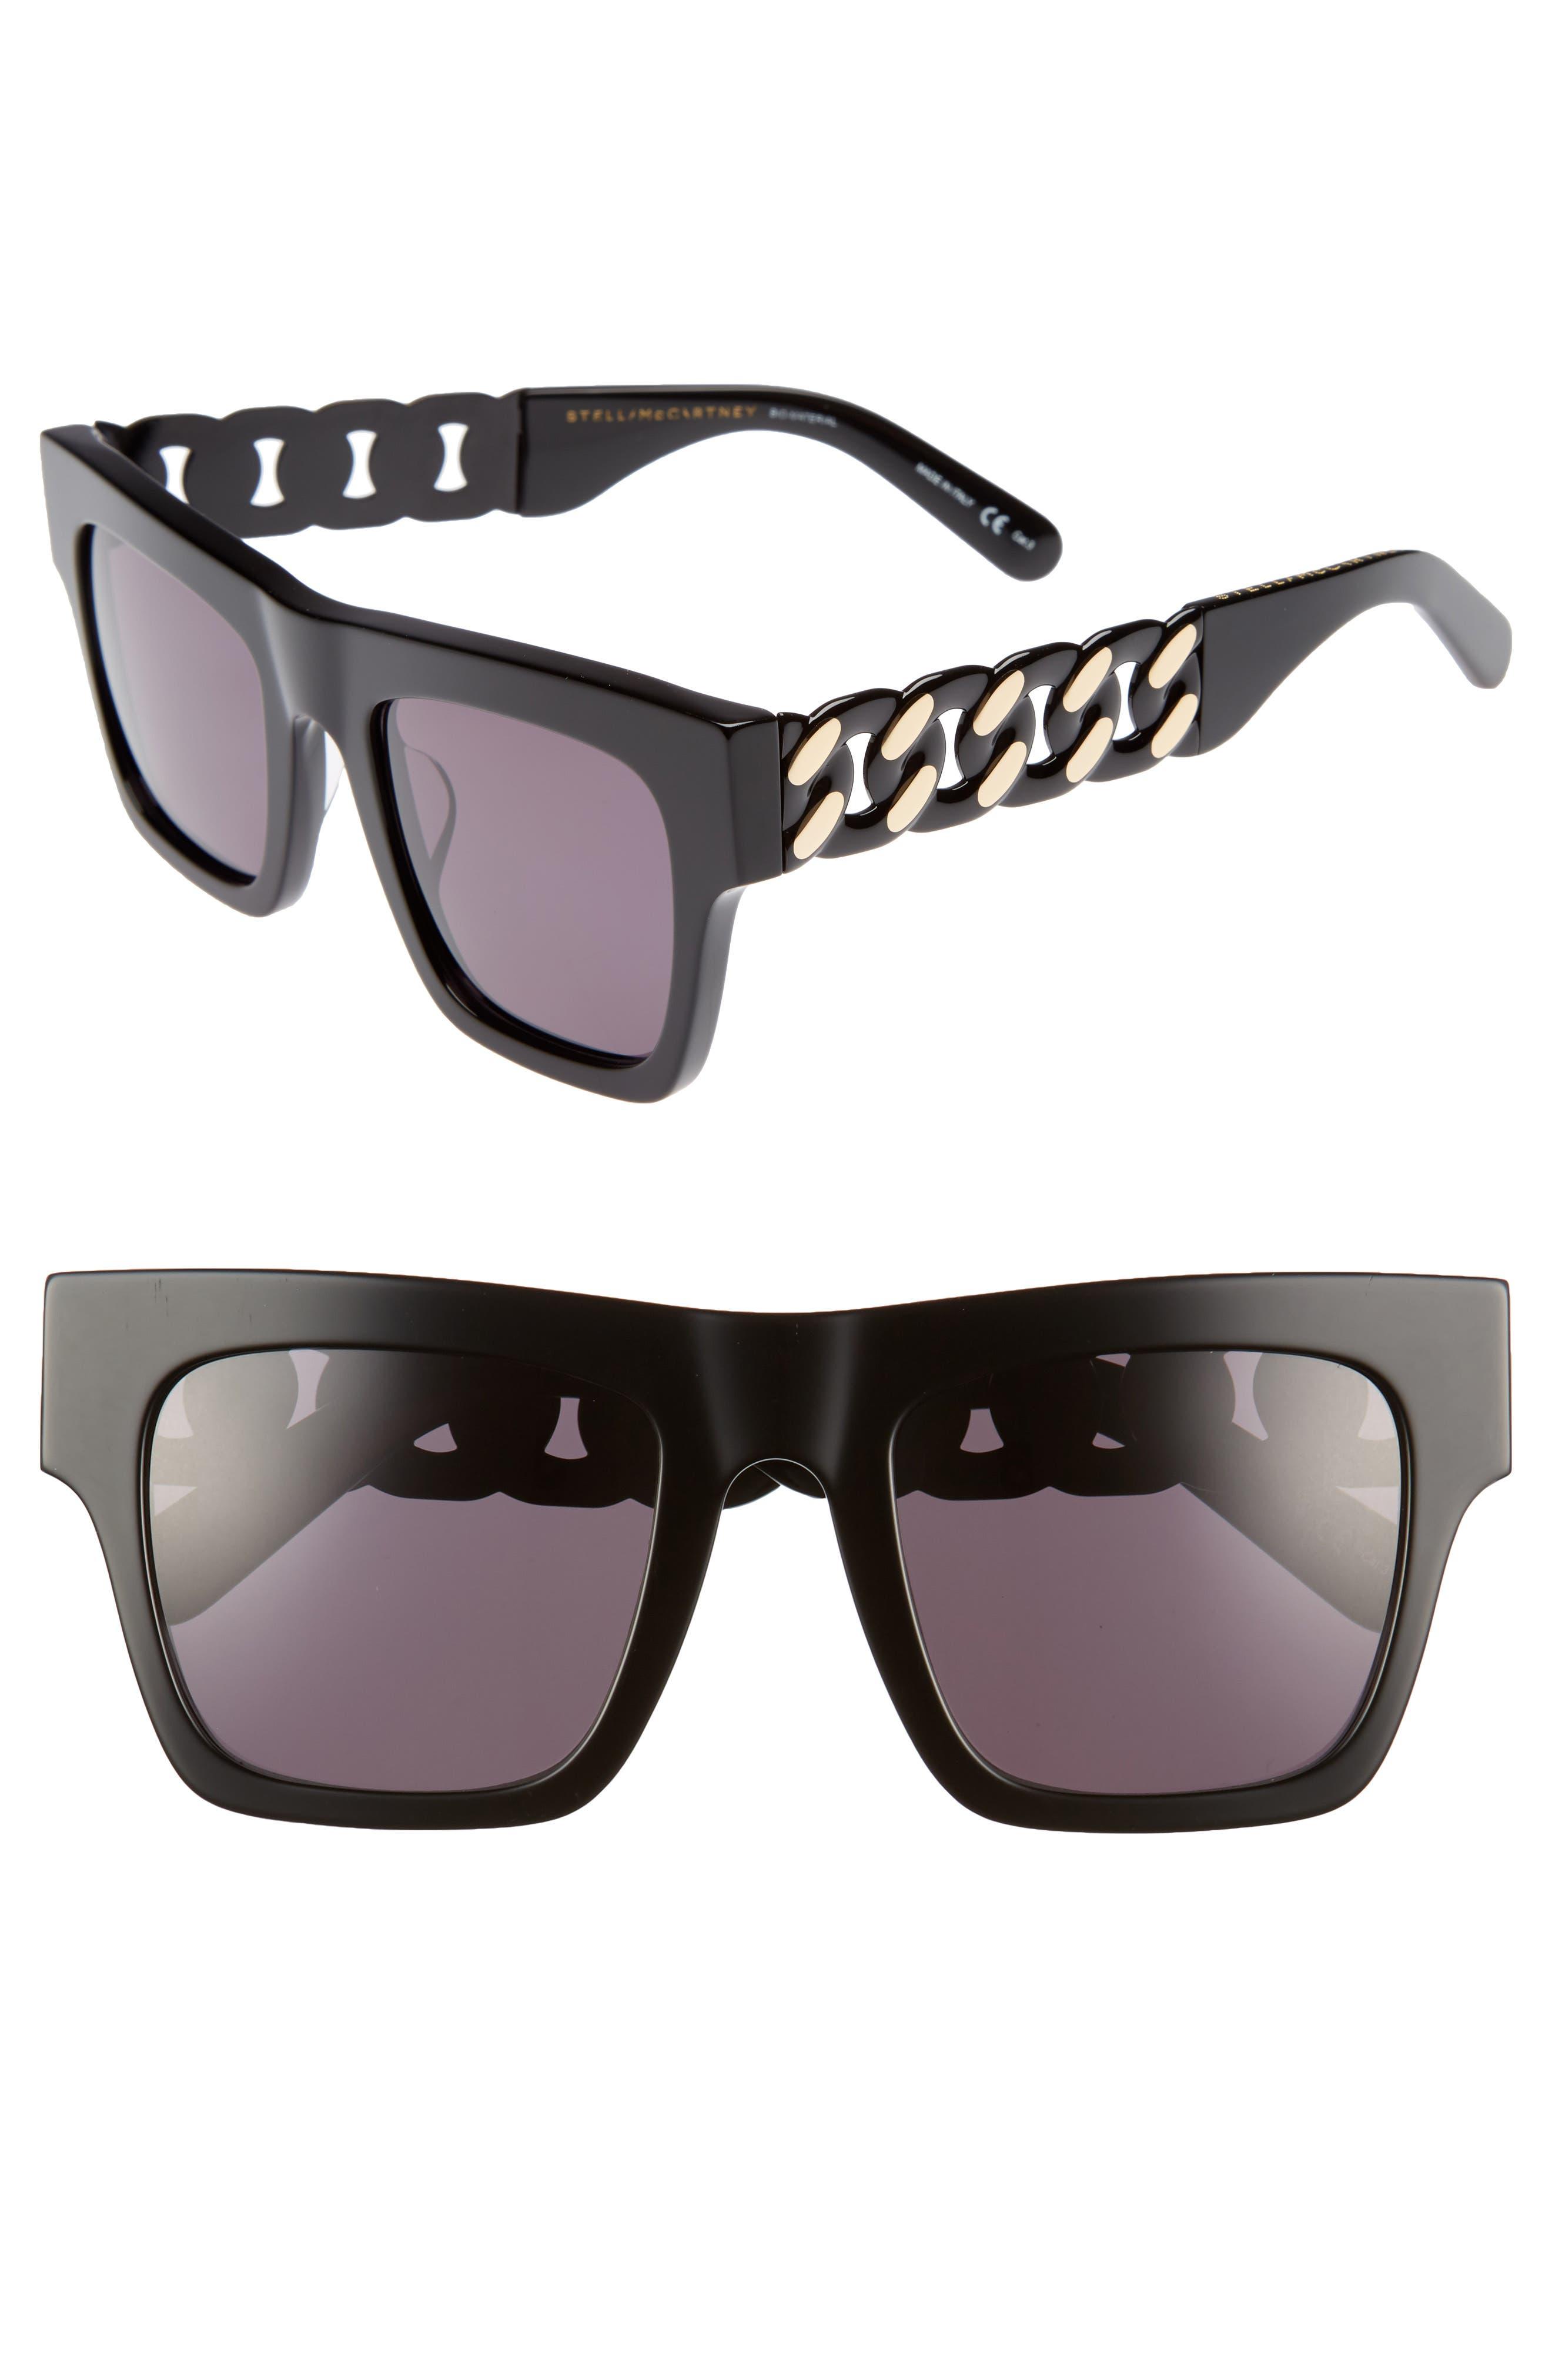 Main Image - Stella McCartney 51mm Square Sunglasses